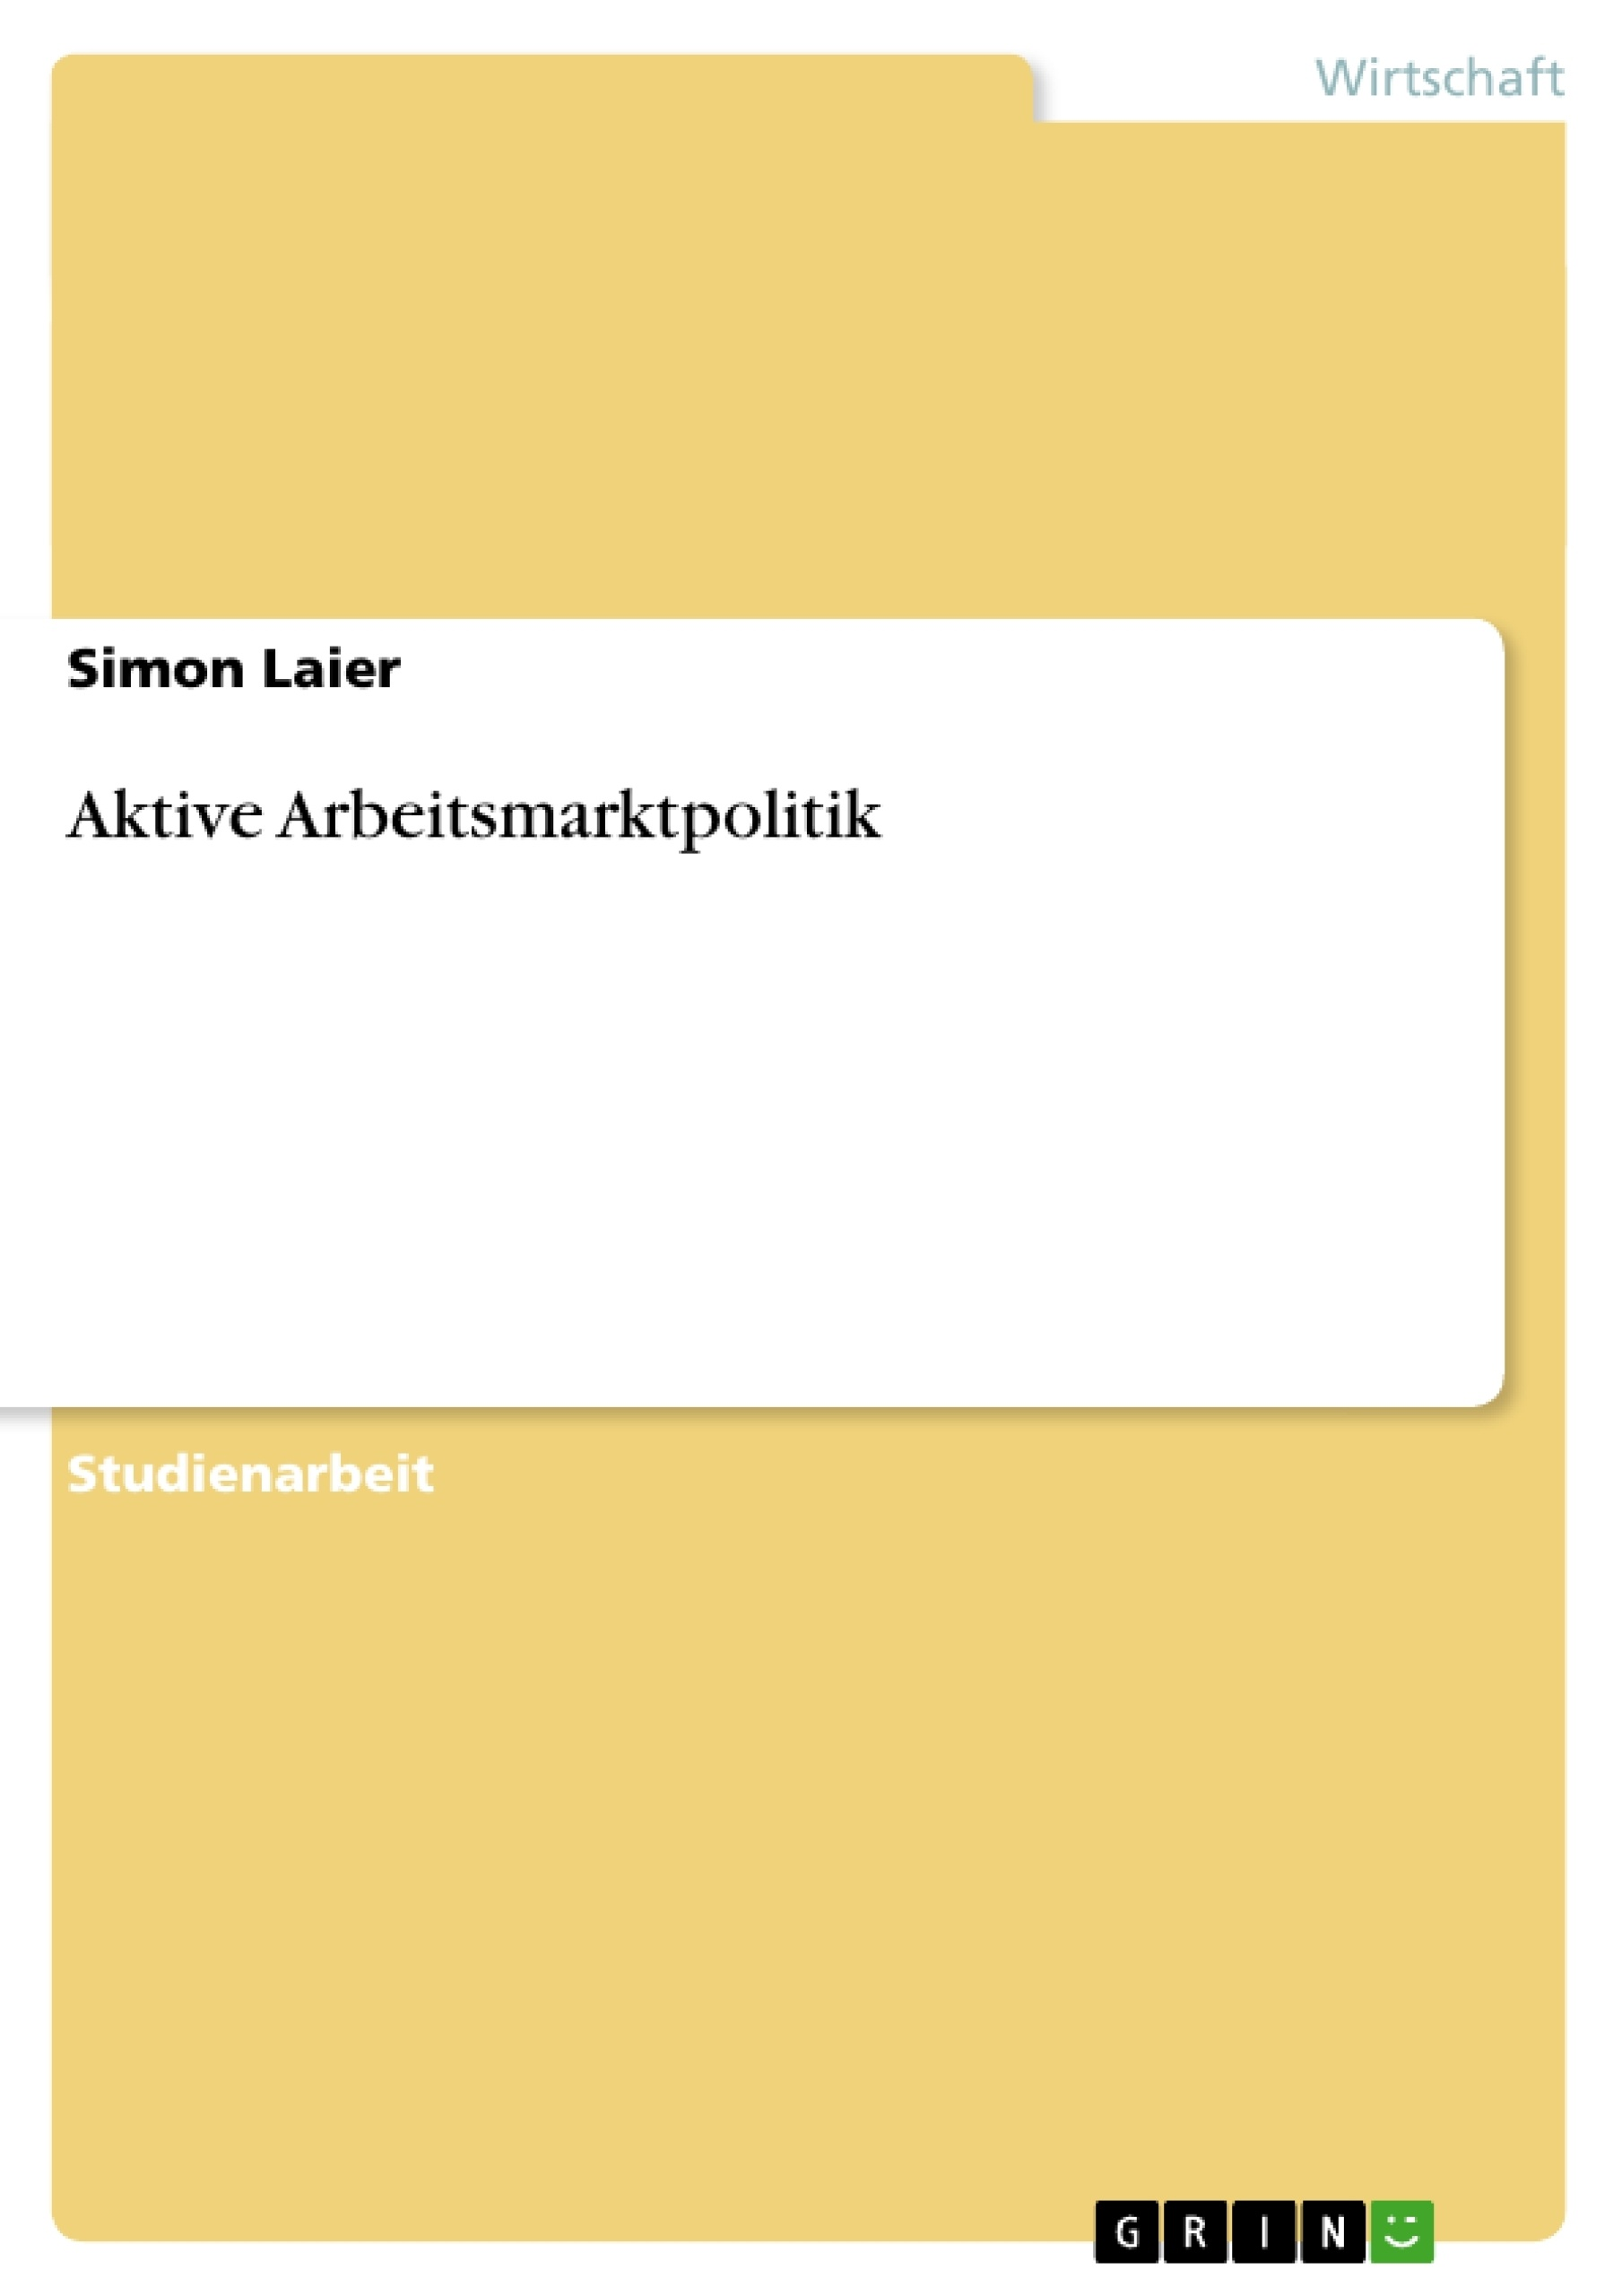 Titel: Aktive Arbeitsmarktpolitik